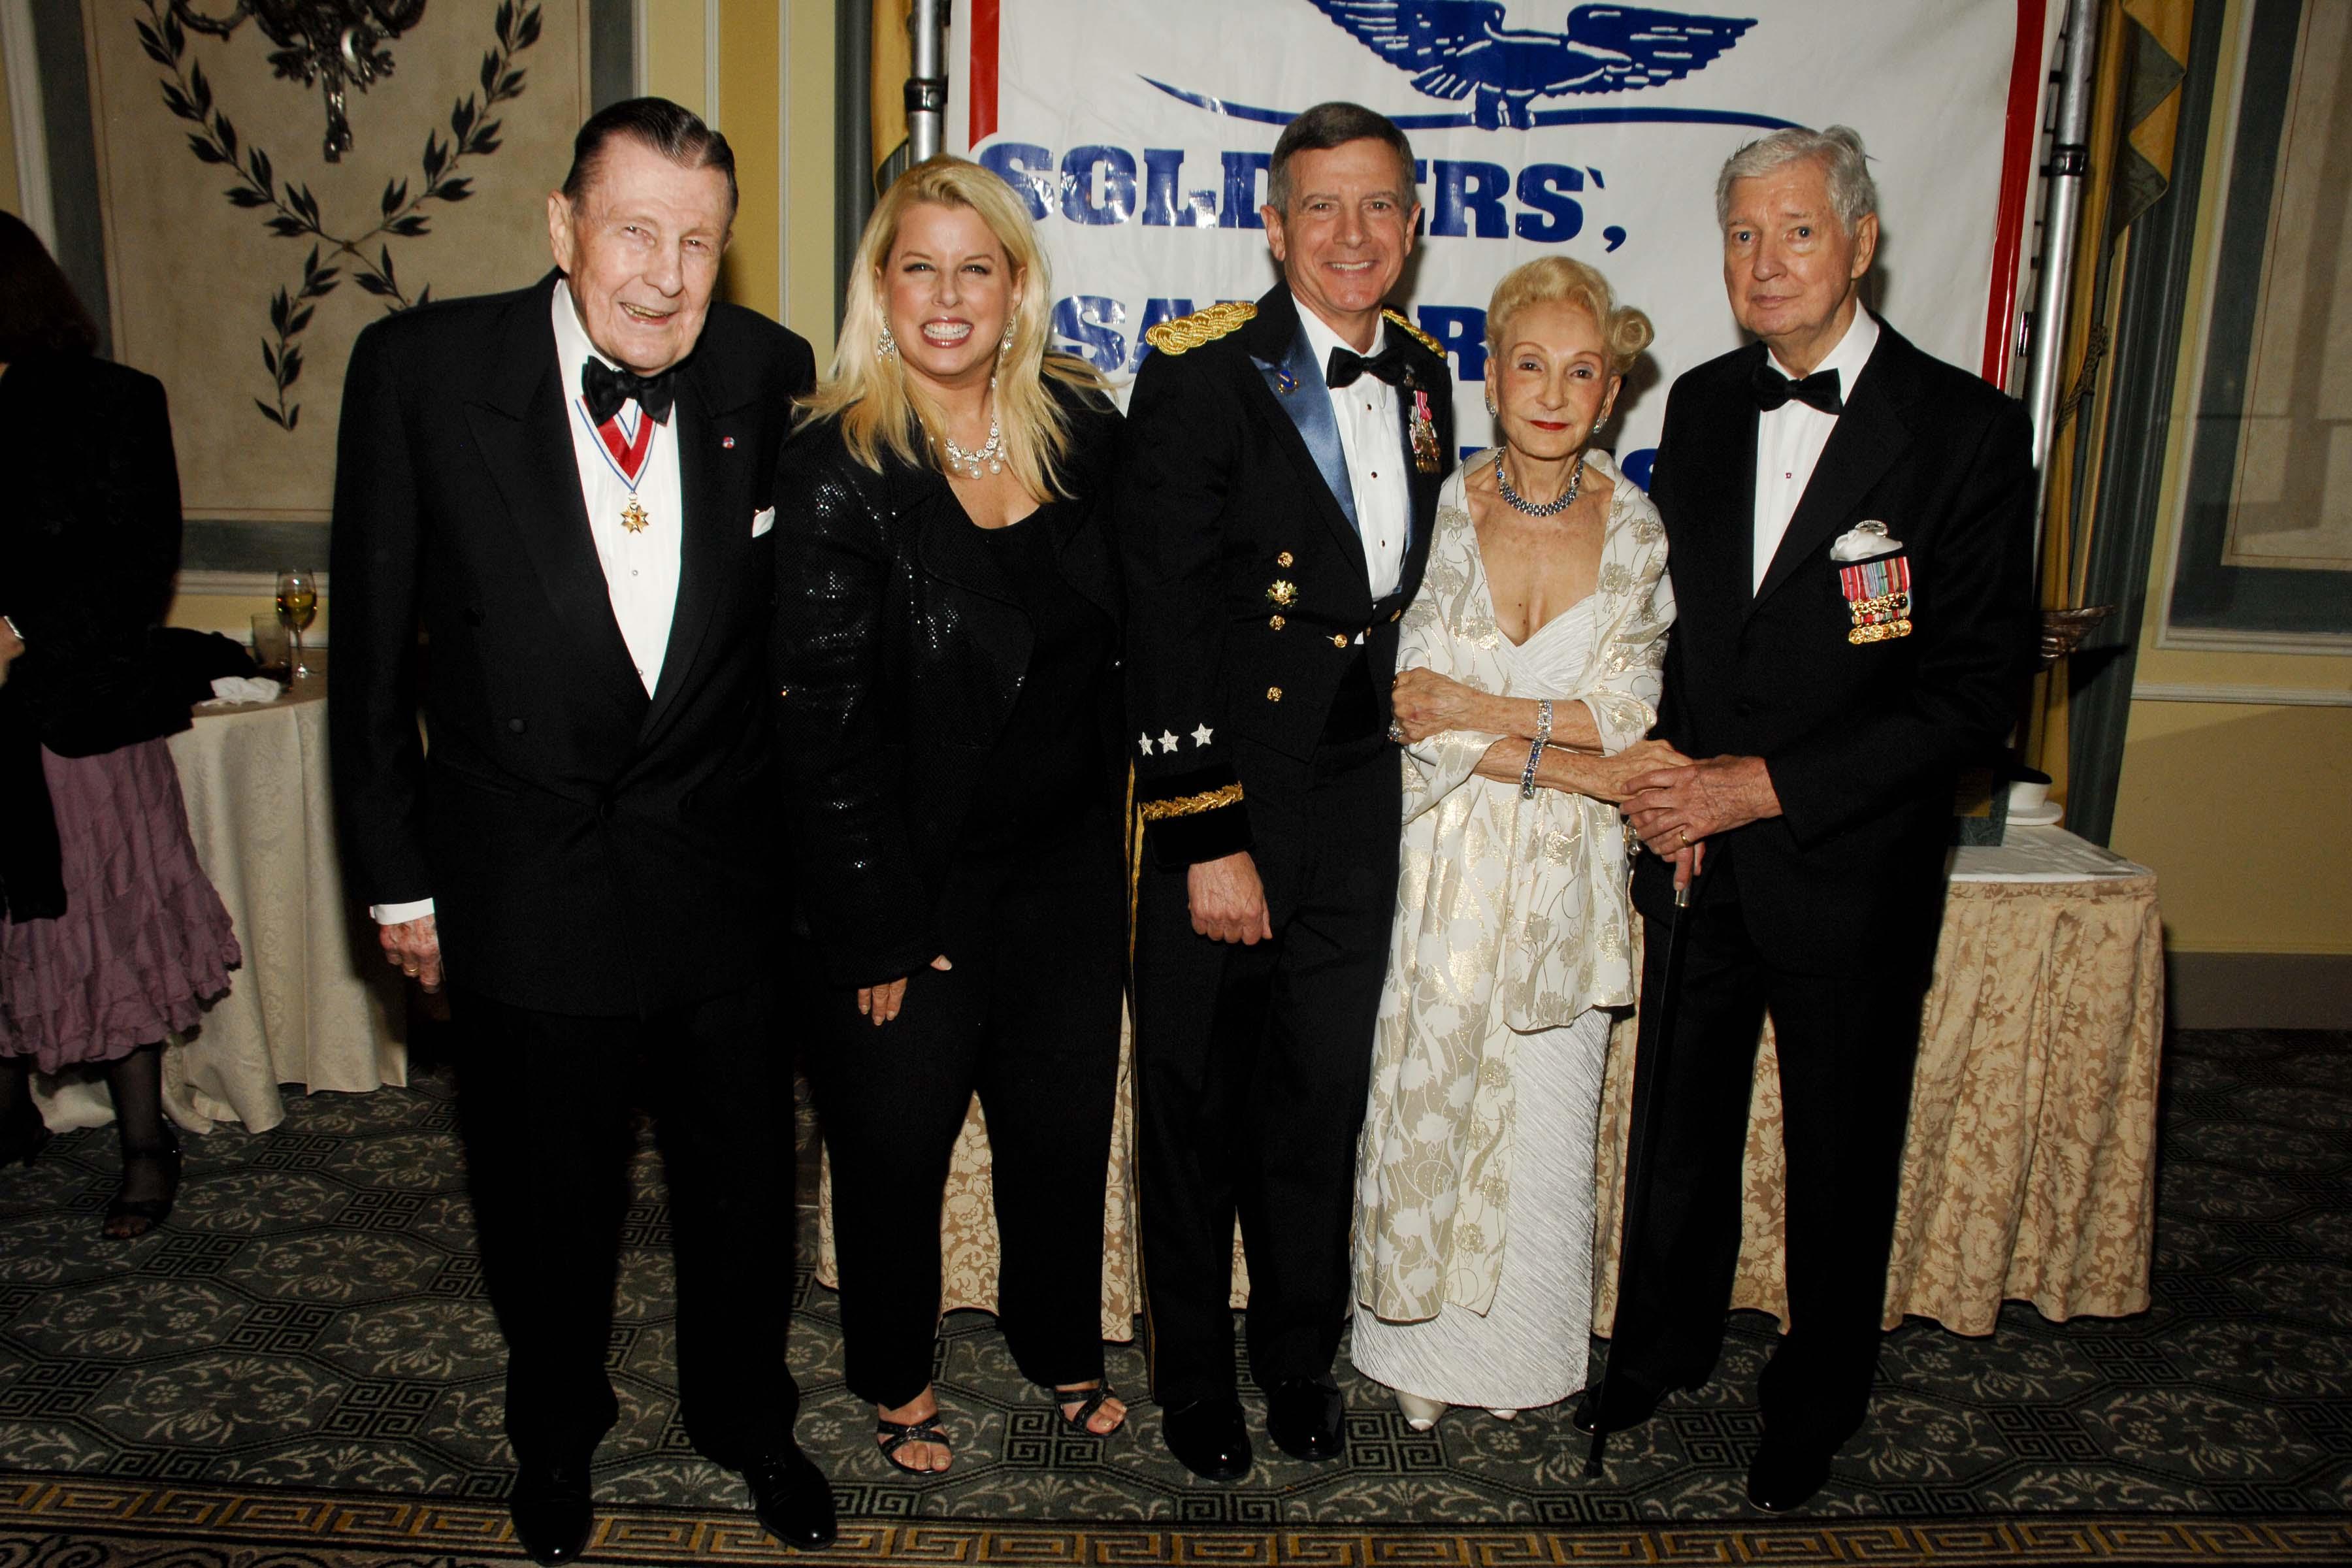 L to R Ivan Obolensky, Rita Cosby, General William J. Troy, Kate Wickham, and Dr. Robert Wickham